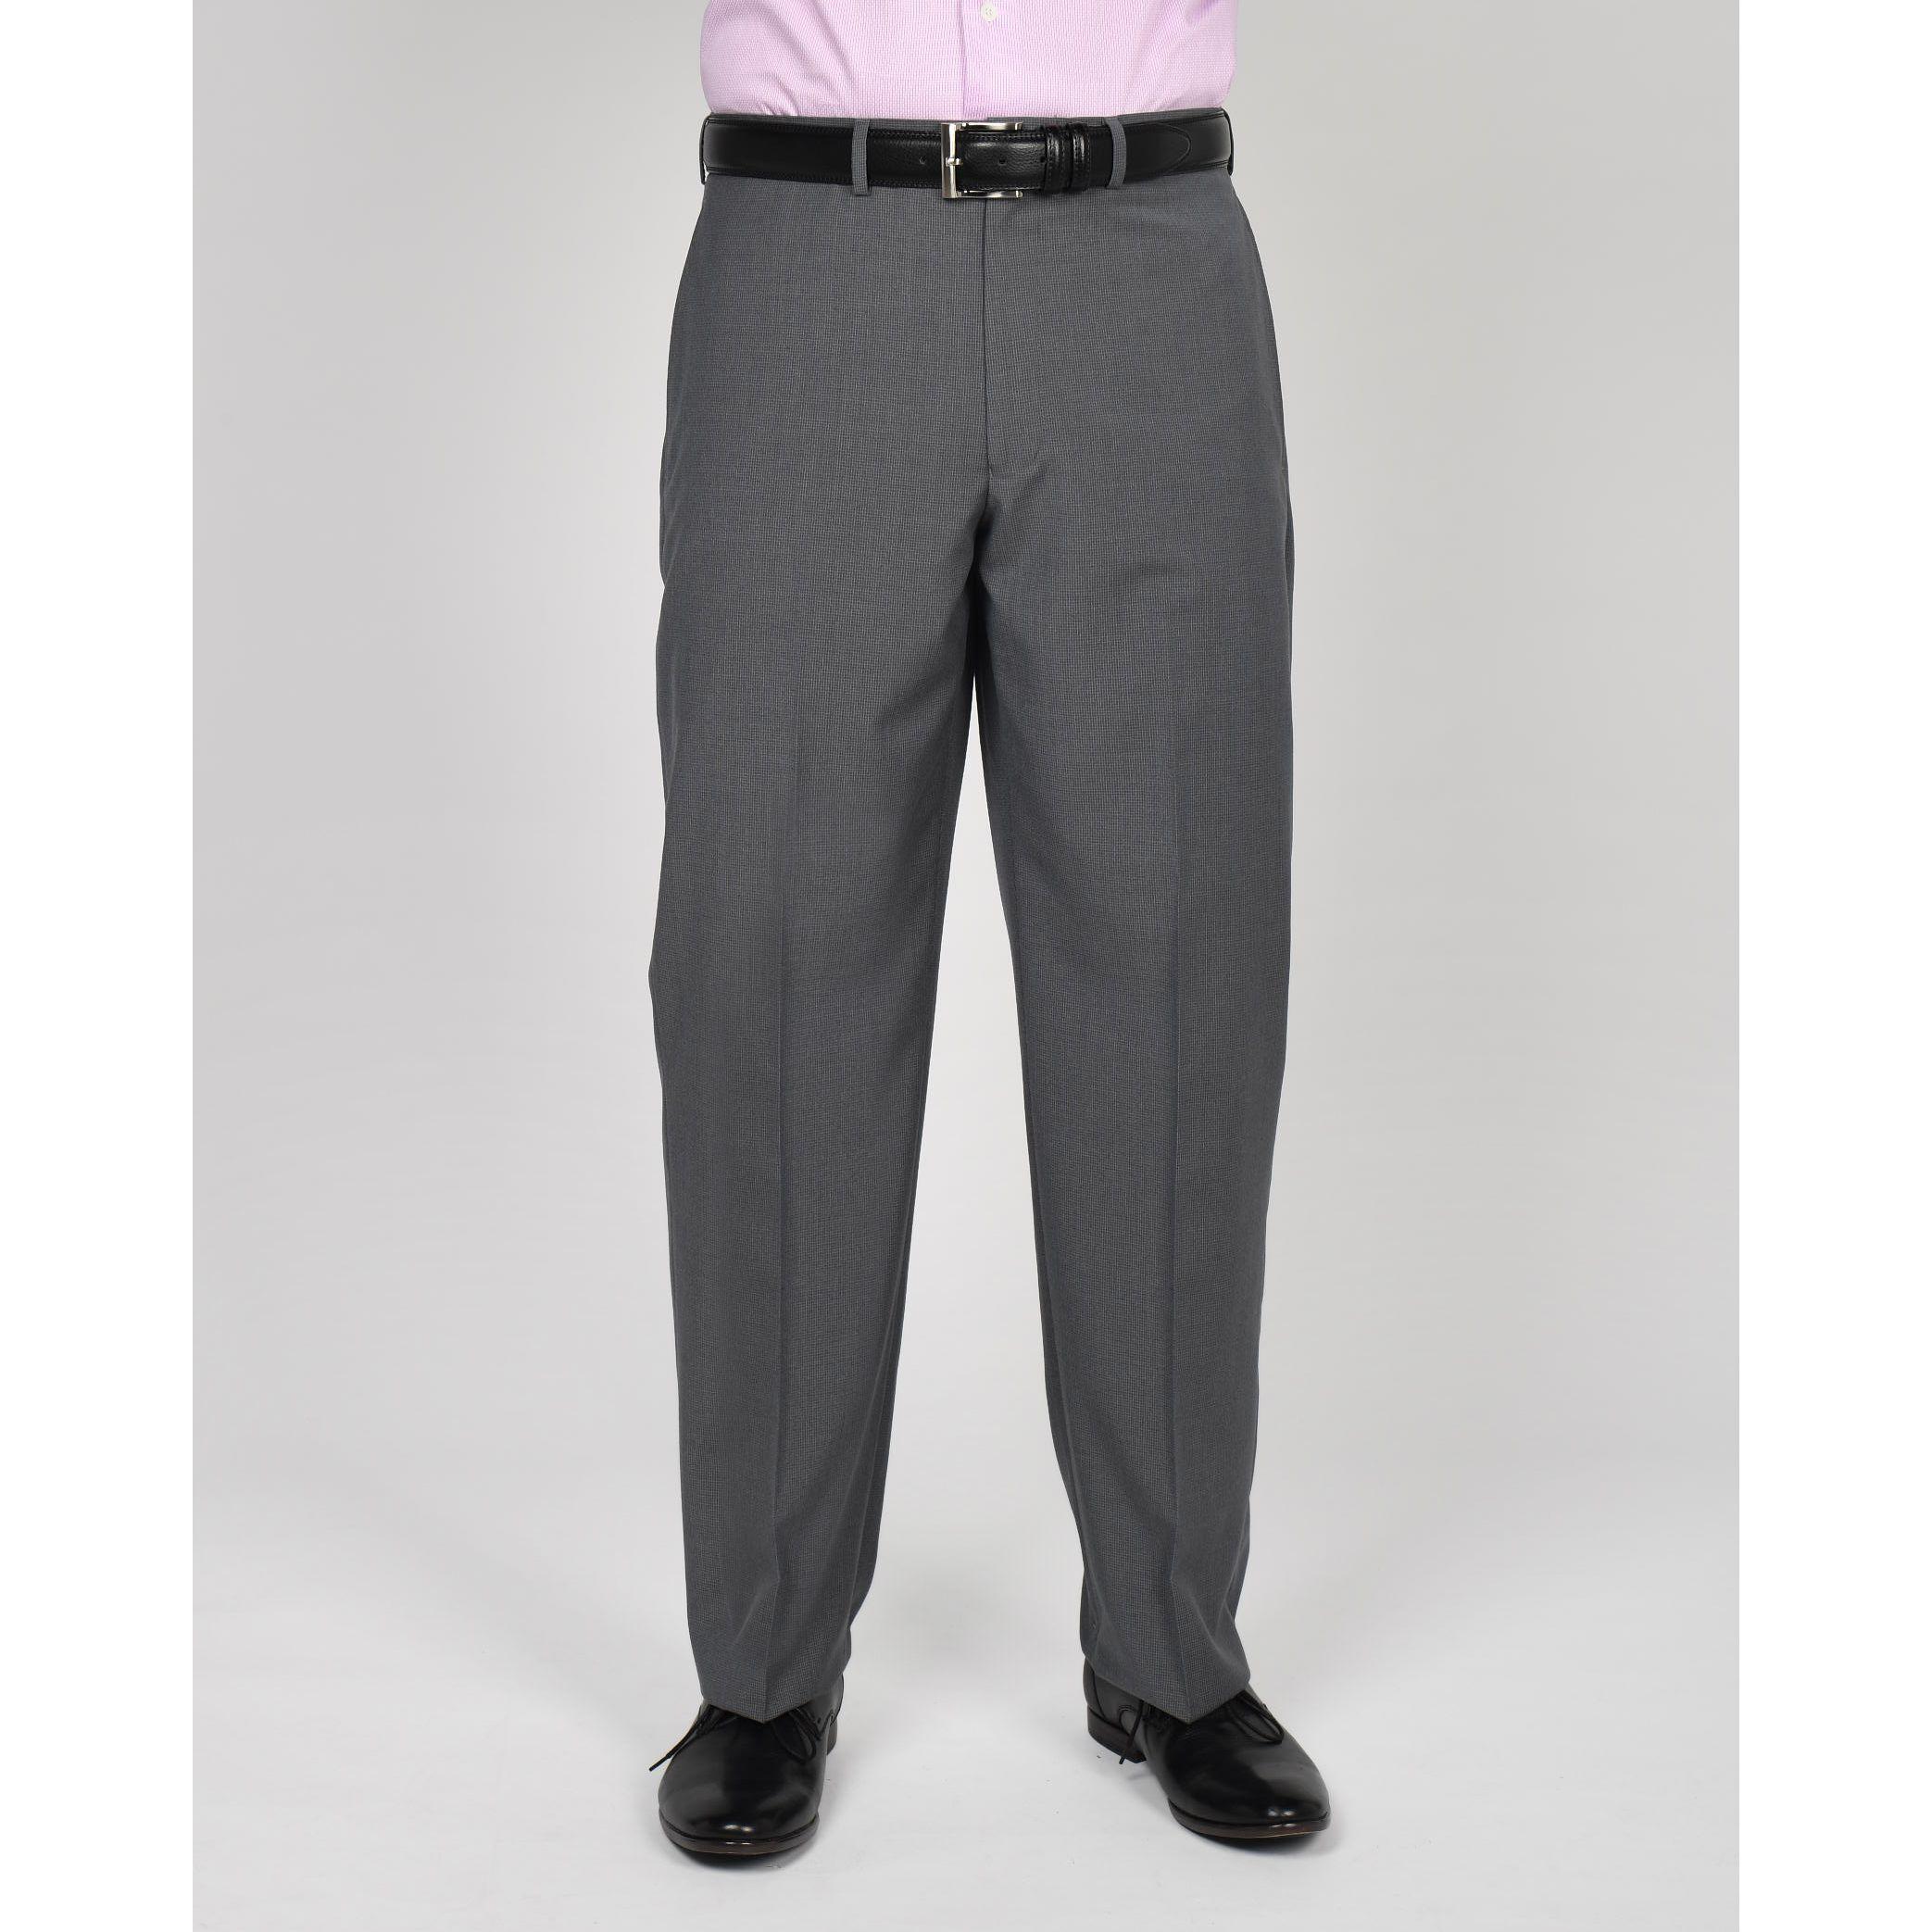 Geoffrey Beene Men's /Rayon Suit Separates Pants